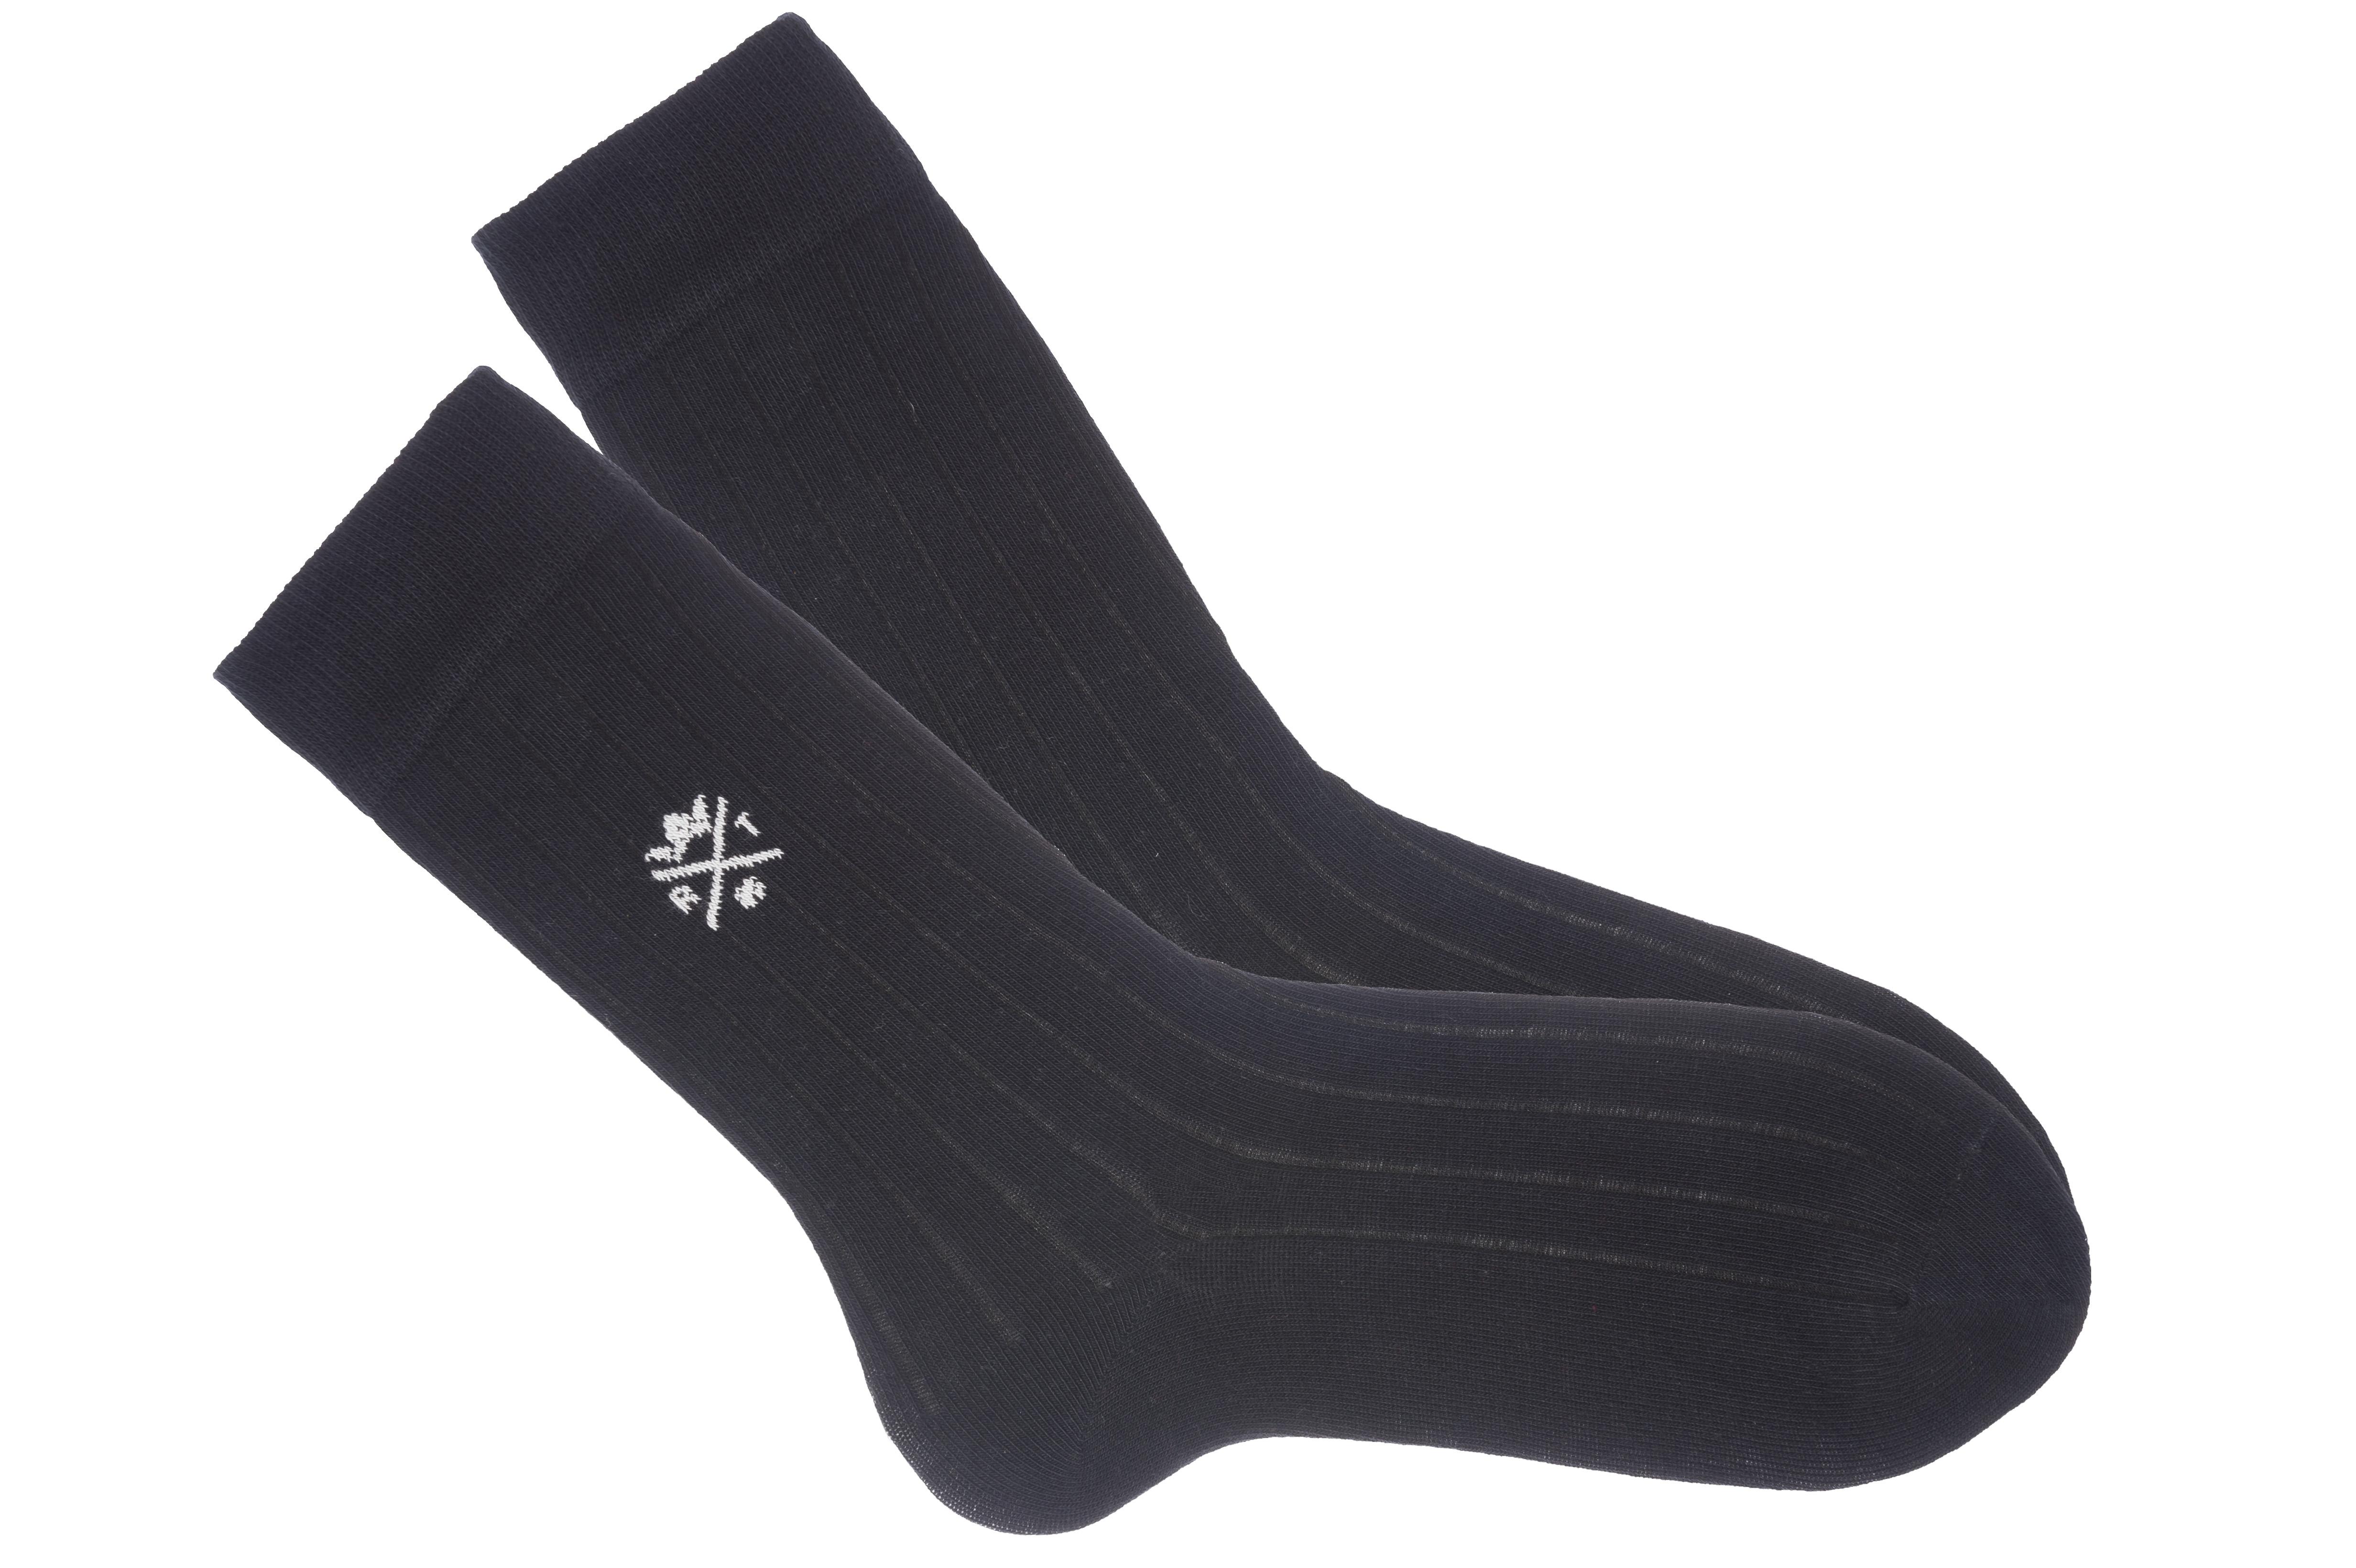 chaussettes homme royalties mickey noir ebene revoit orleans